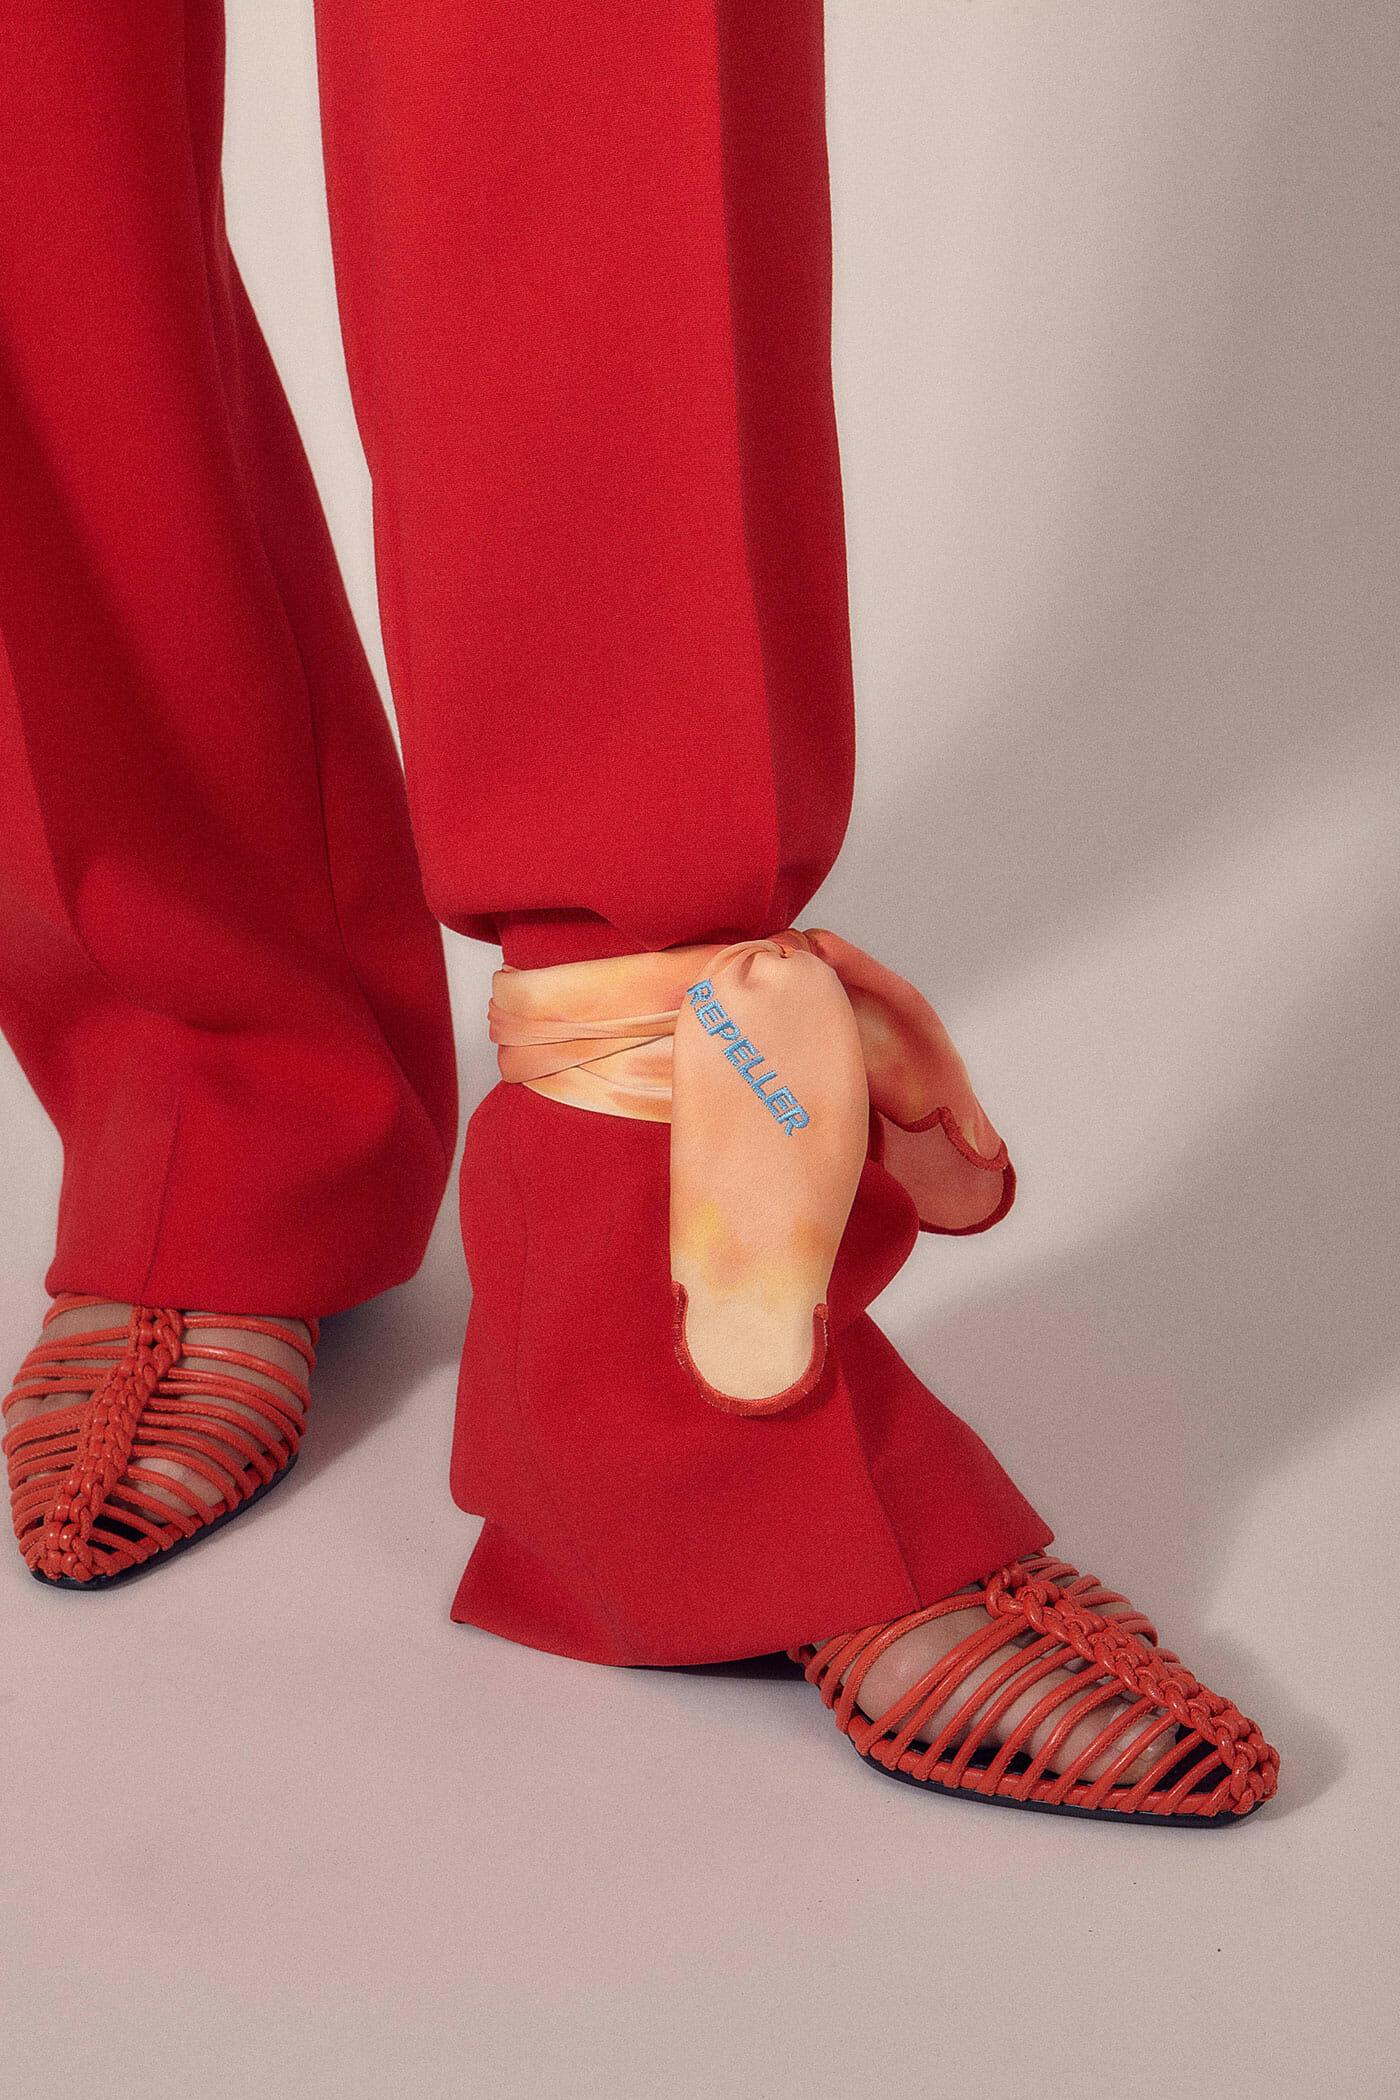 resort trend tied pants harling ross man repeller